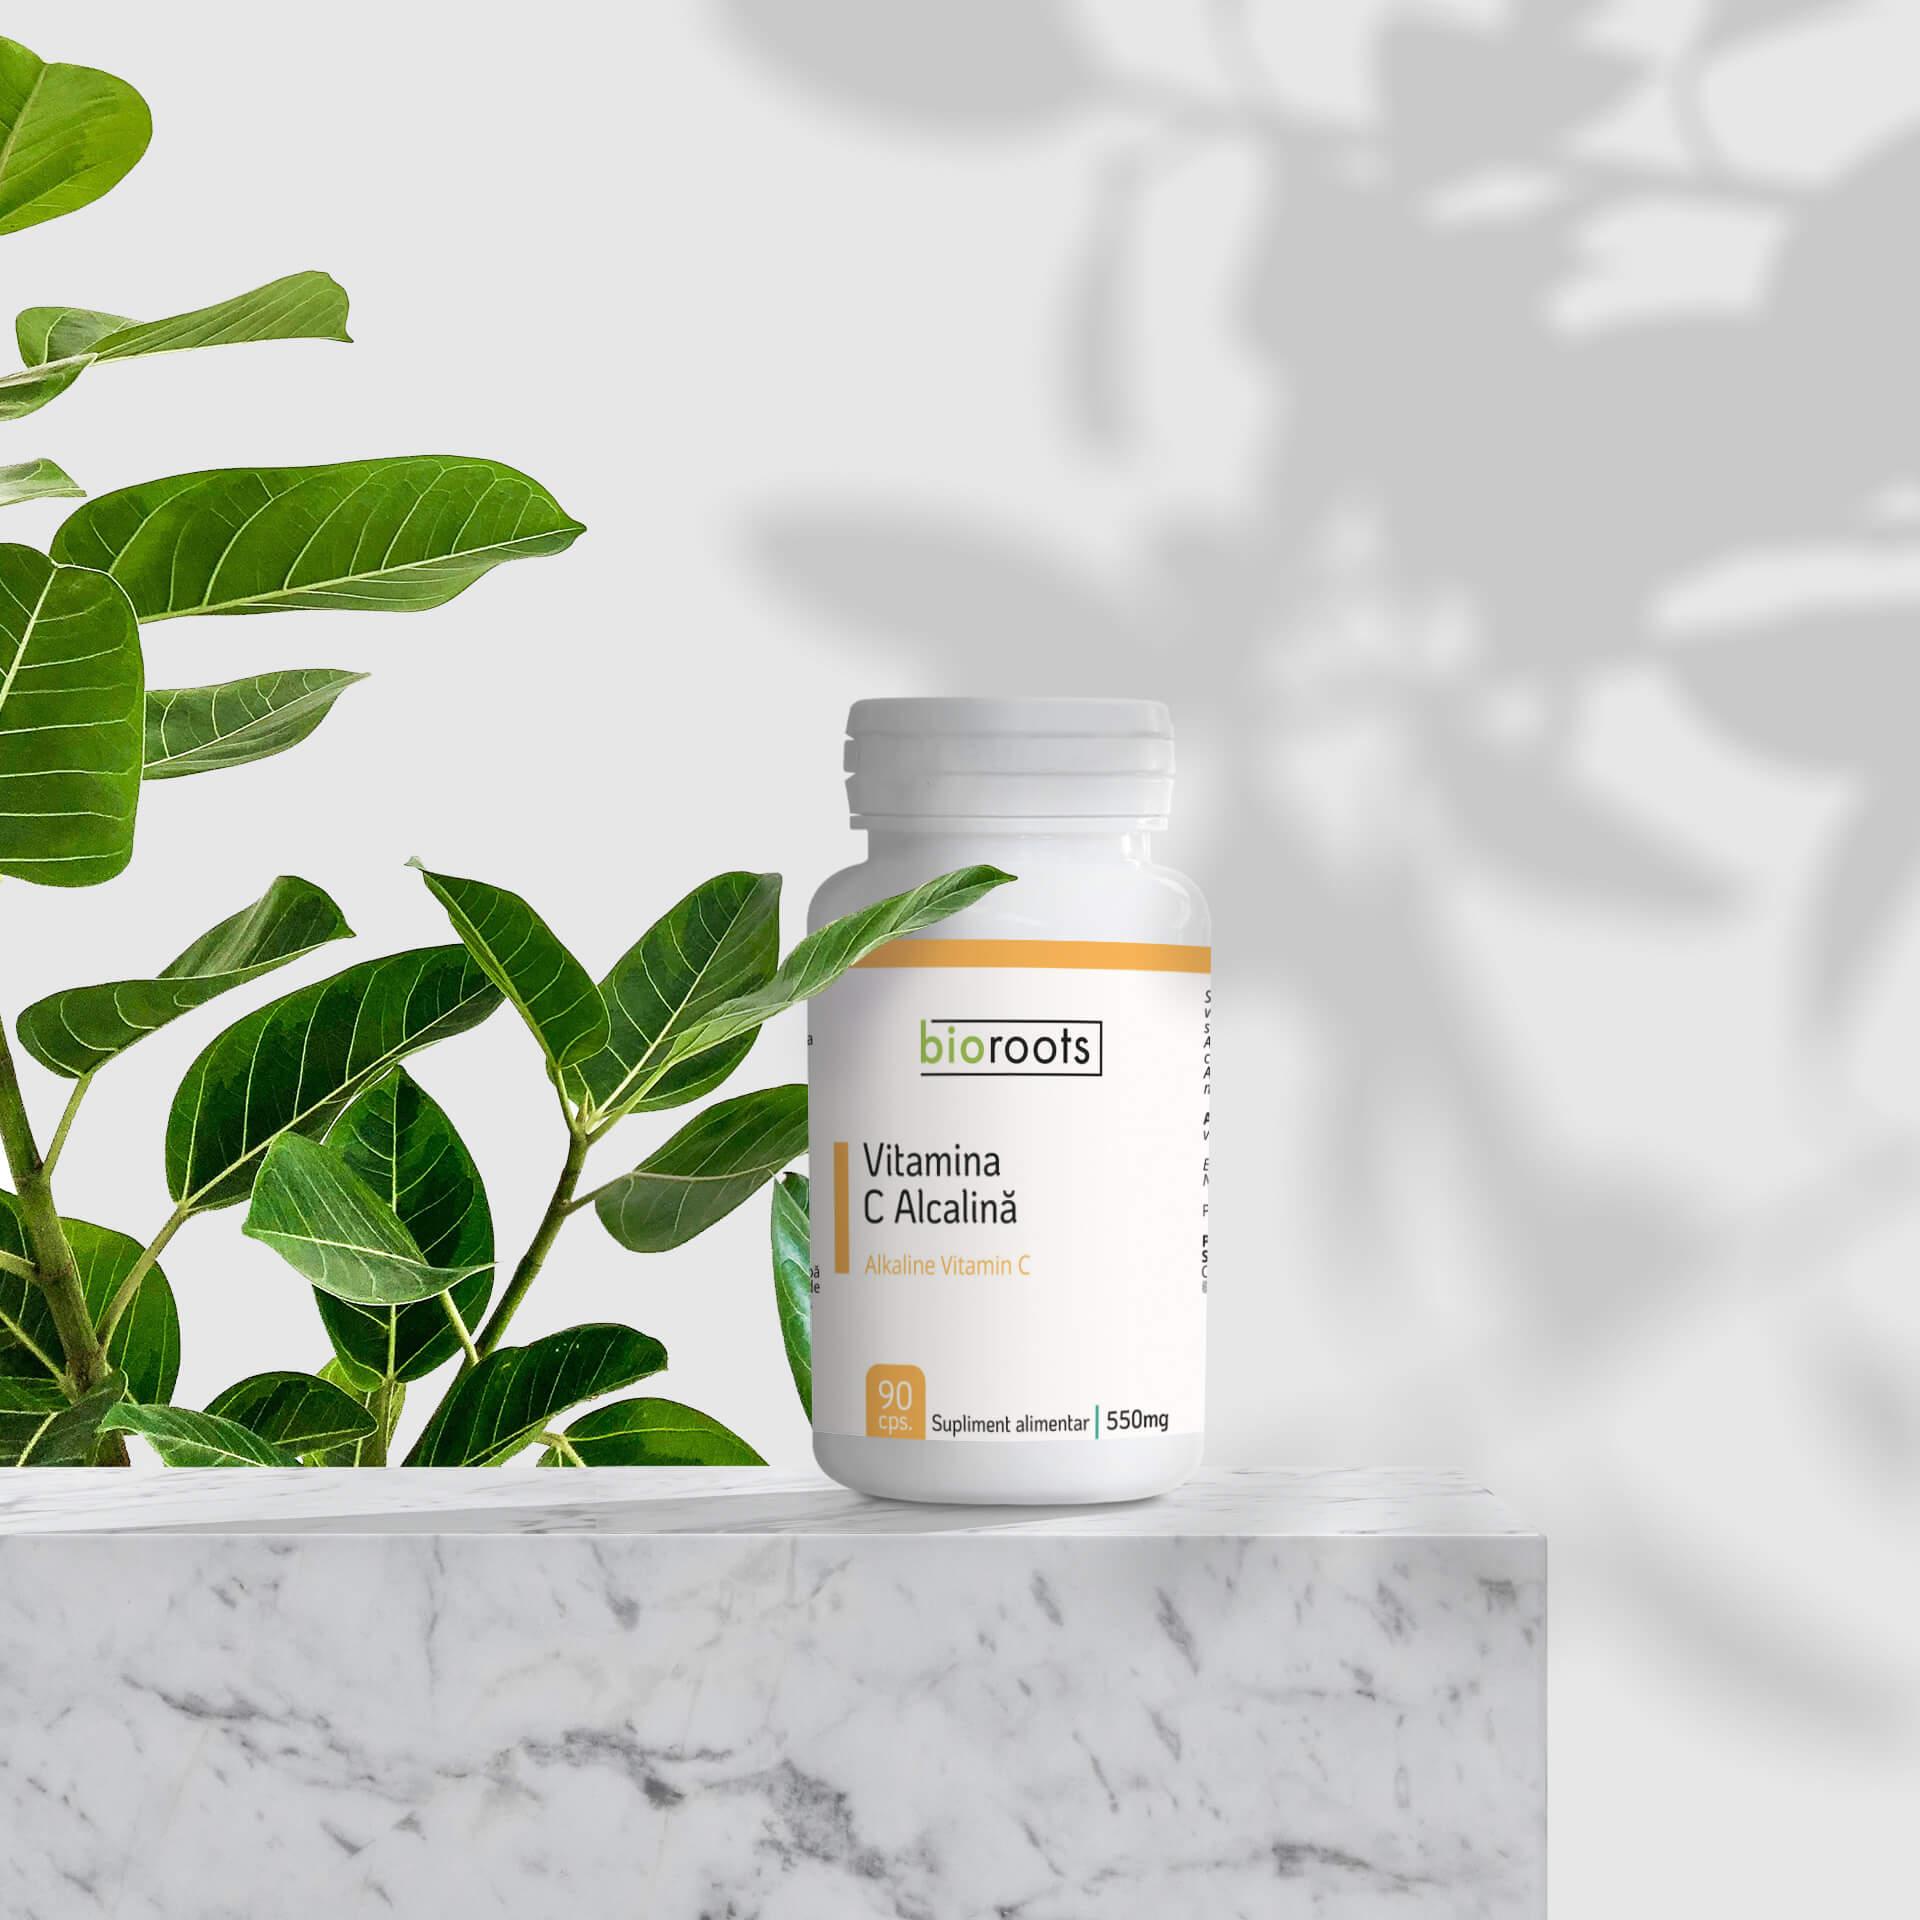 Vitamina C Alcalină 700mg, 90 capsule vegetale (63g)   Bioroots